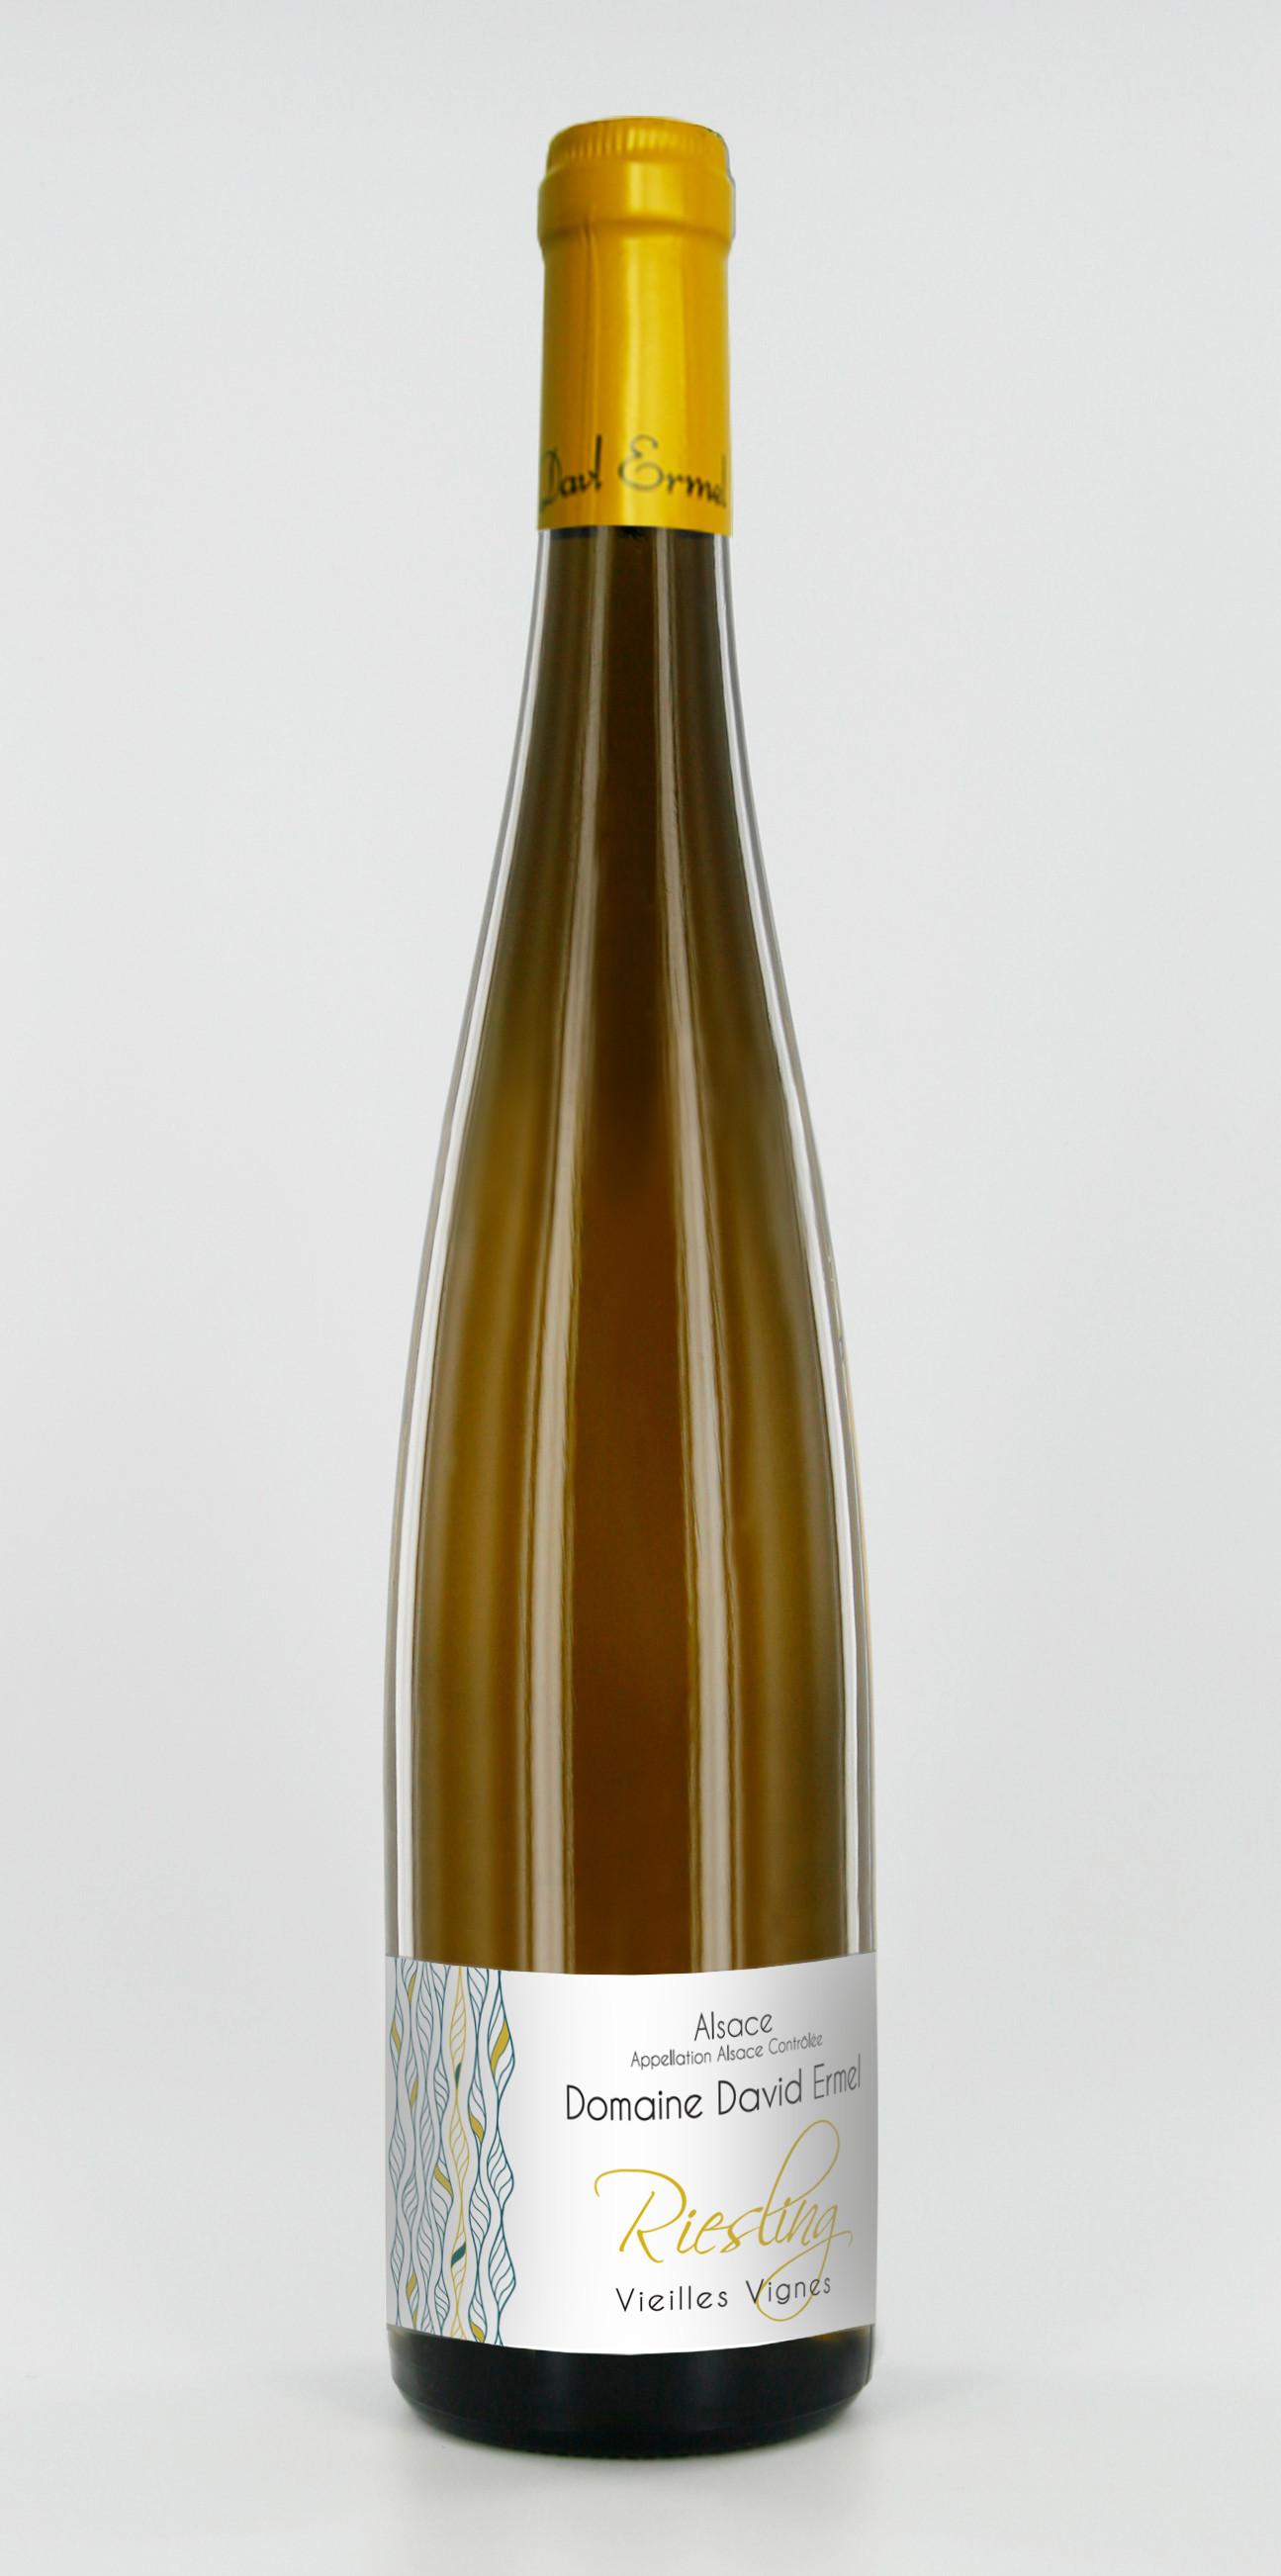 Riesling Vieilles vignes - Vins Hunawihr Alsace